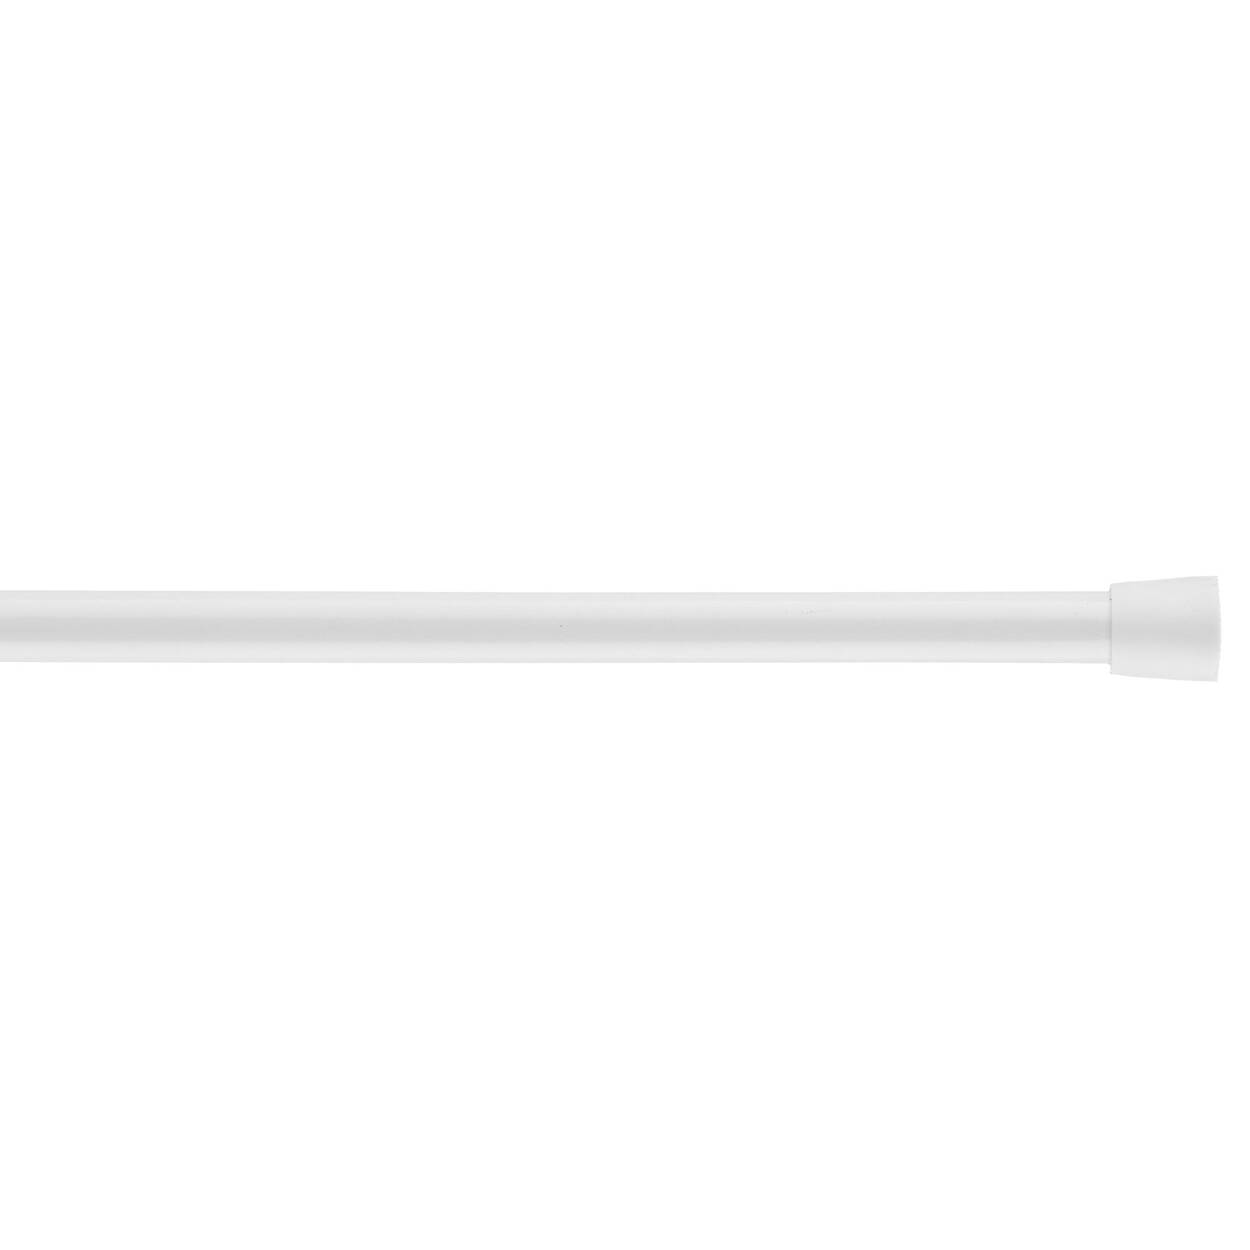 Curtain Tension Rod - Diameter 7/16 in